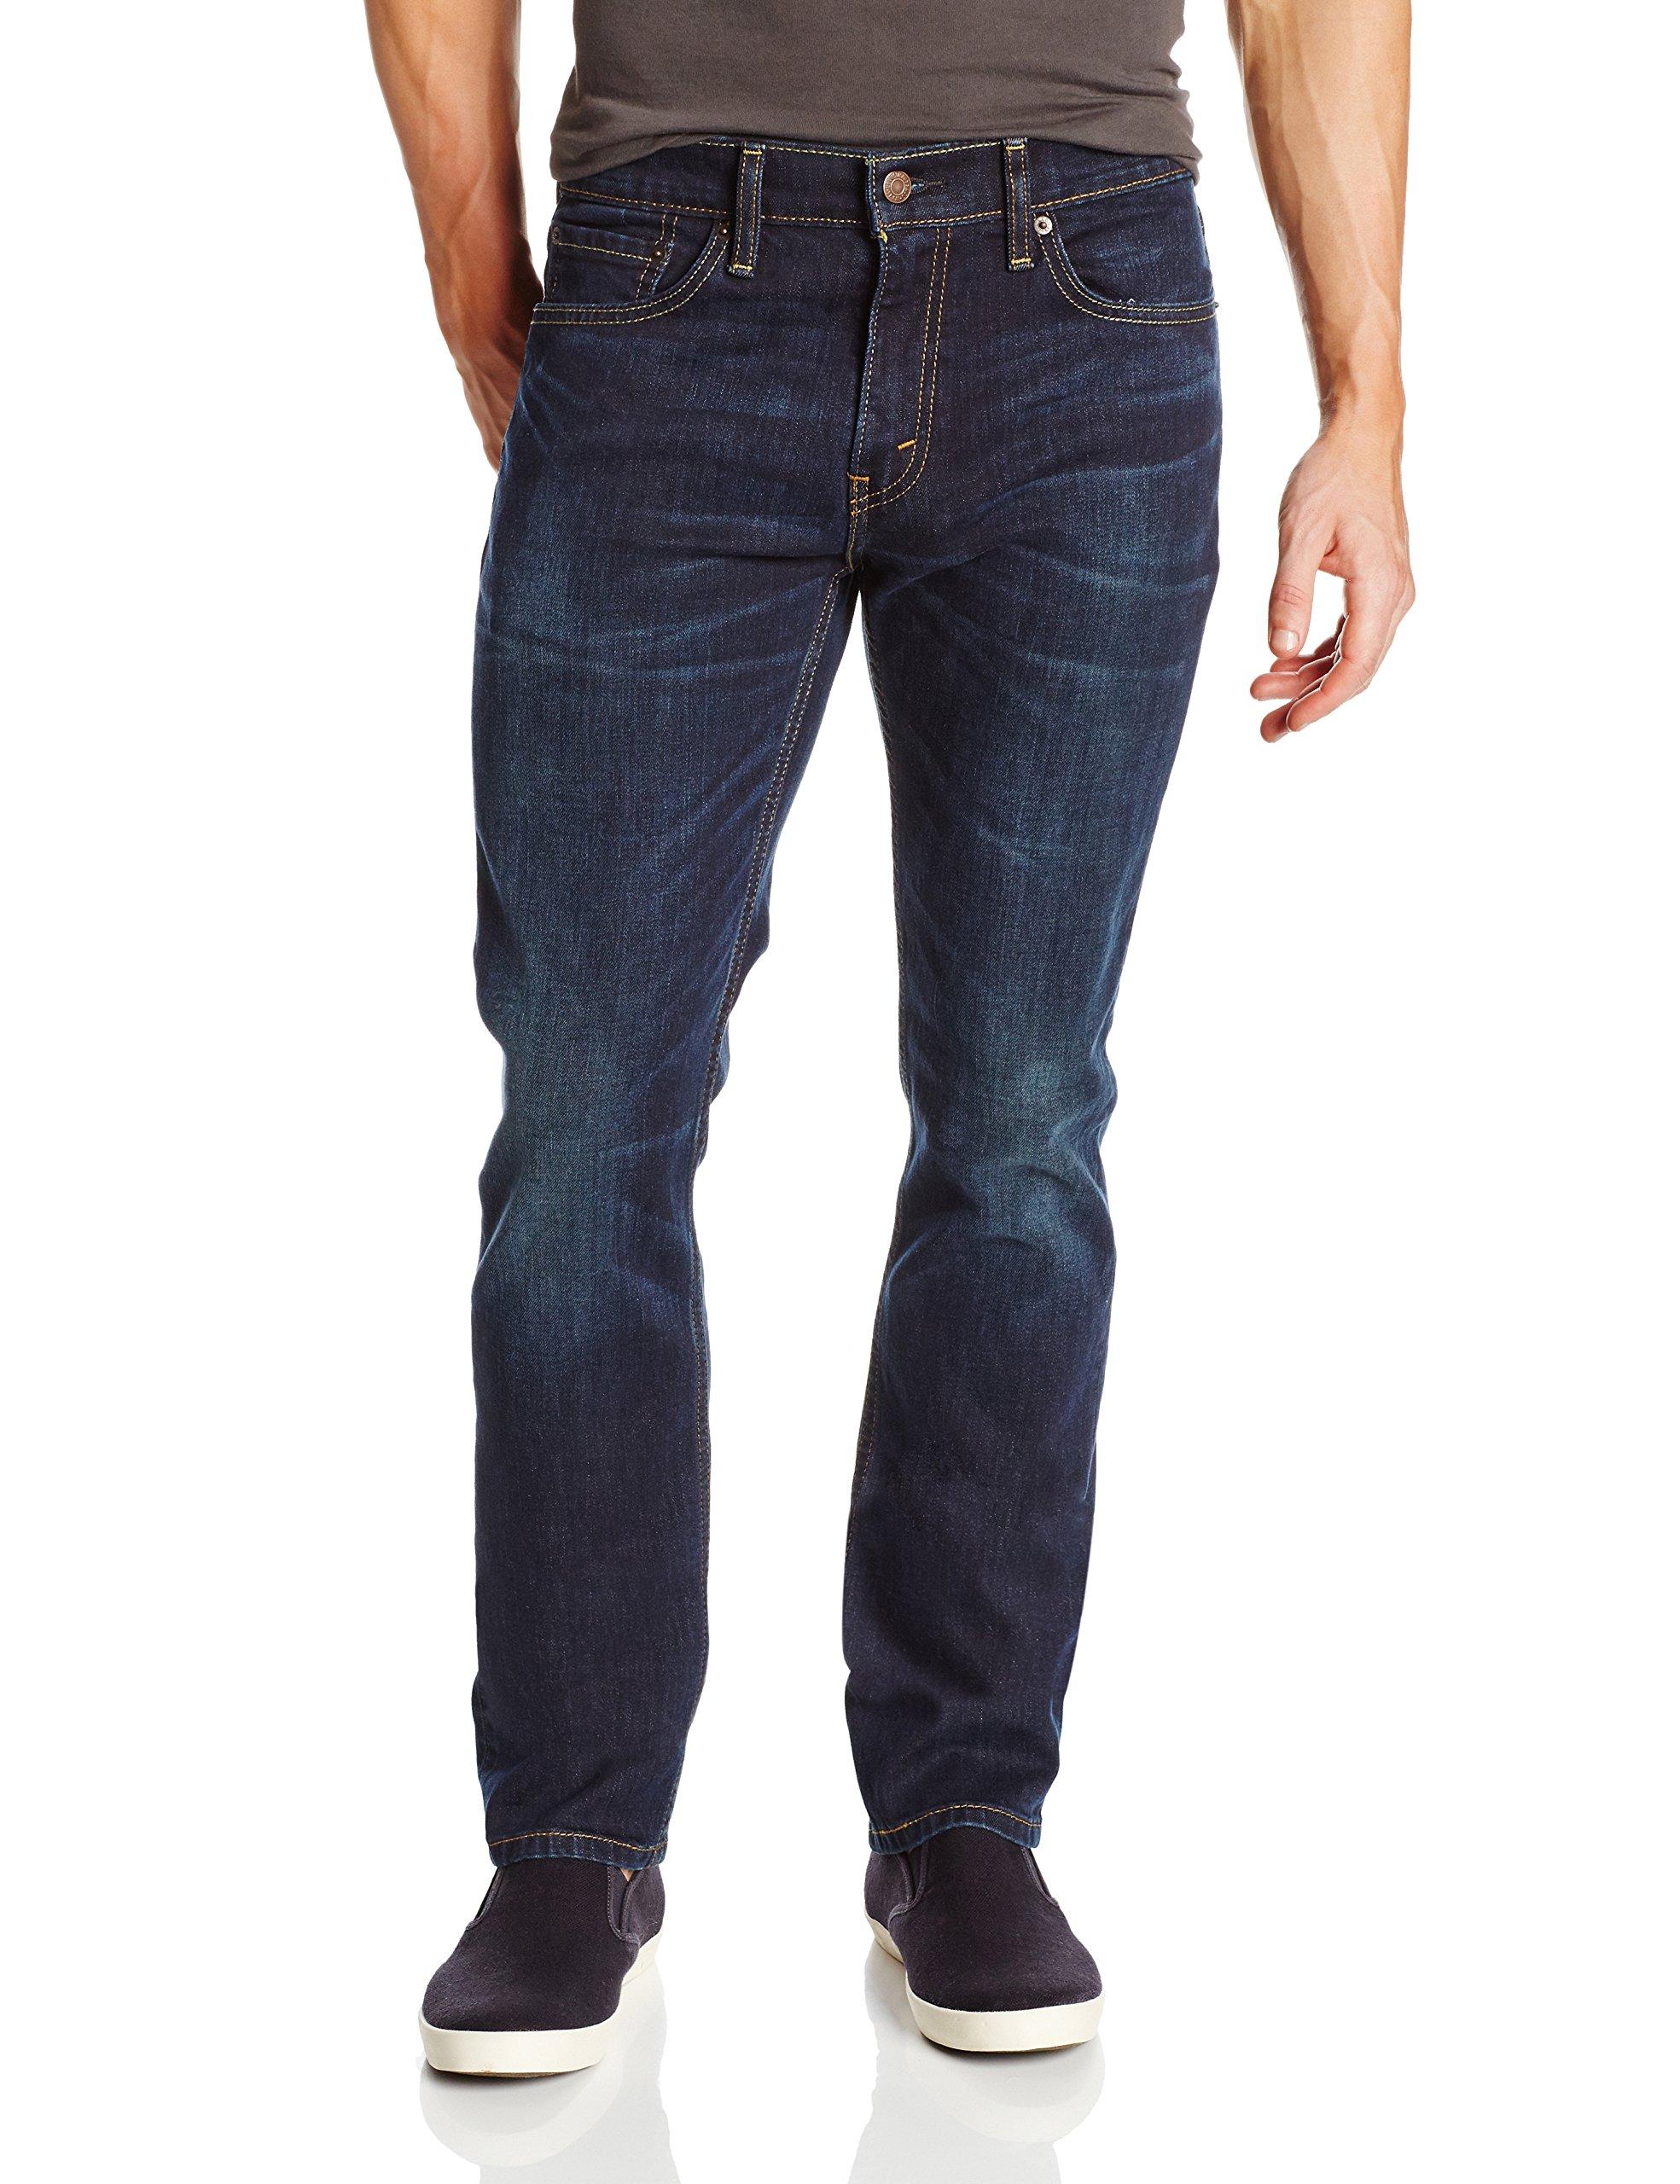 Levi's Men's 511 Slim Fit Jean, Sequoia - Stretch, 30W x 32L